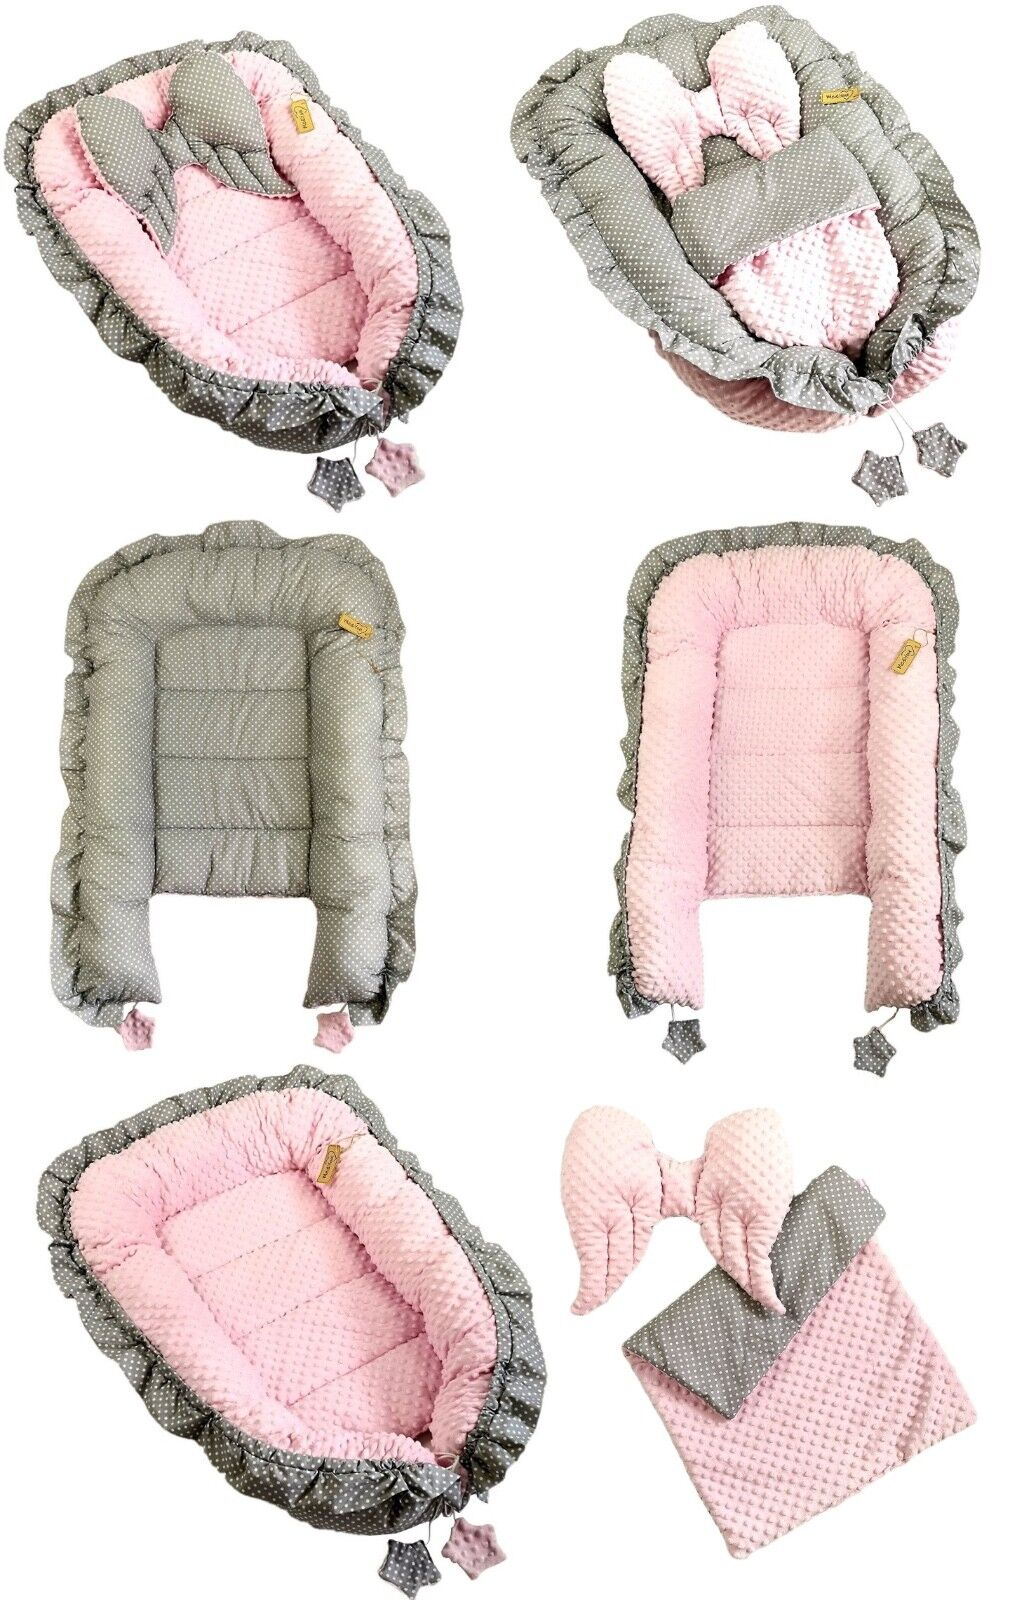 39 Babynest Babybett Babynestchen Reisebett Decke Kopfkissen 5 in1 Sweet Nest